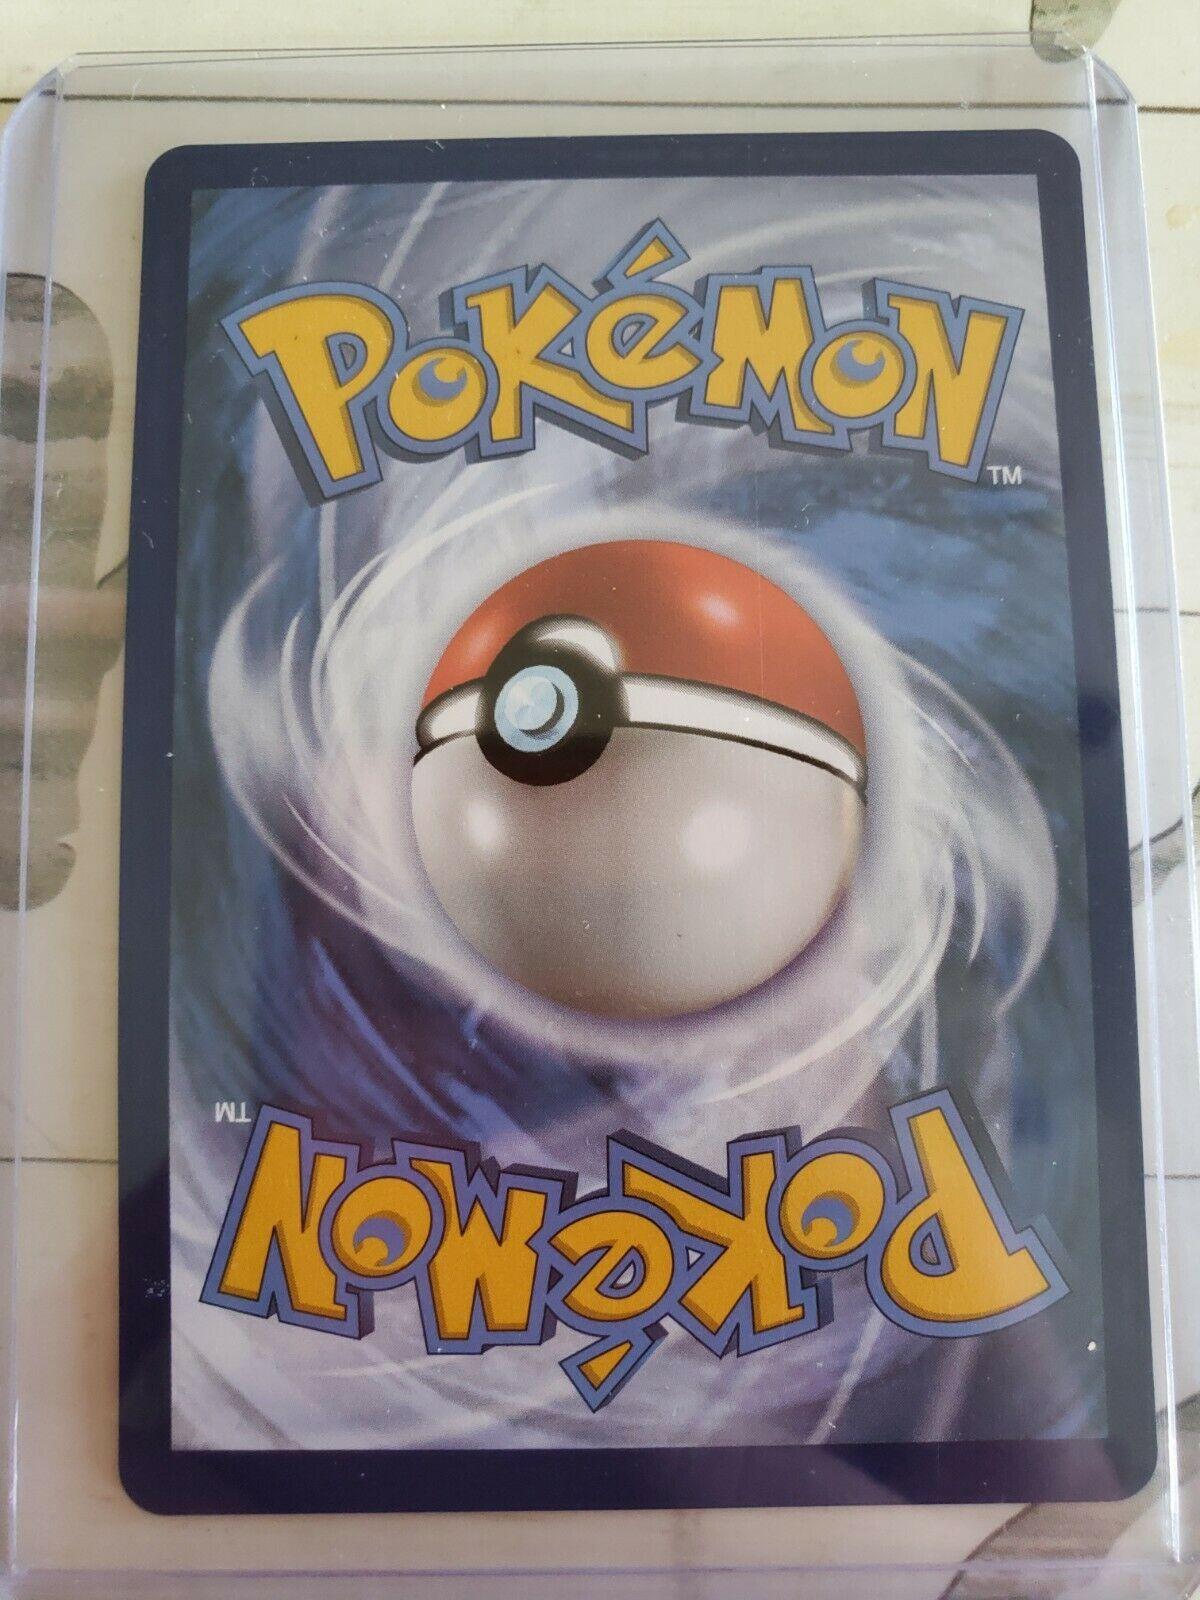 Pokemon Blaziken VMAX 021/198 Full Art Ultra Rare Chilling Reign MINT!! 21/198 - Image 2